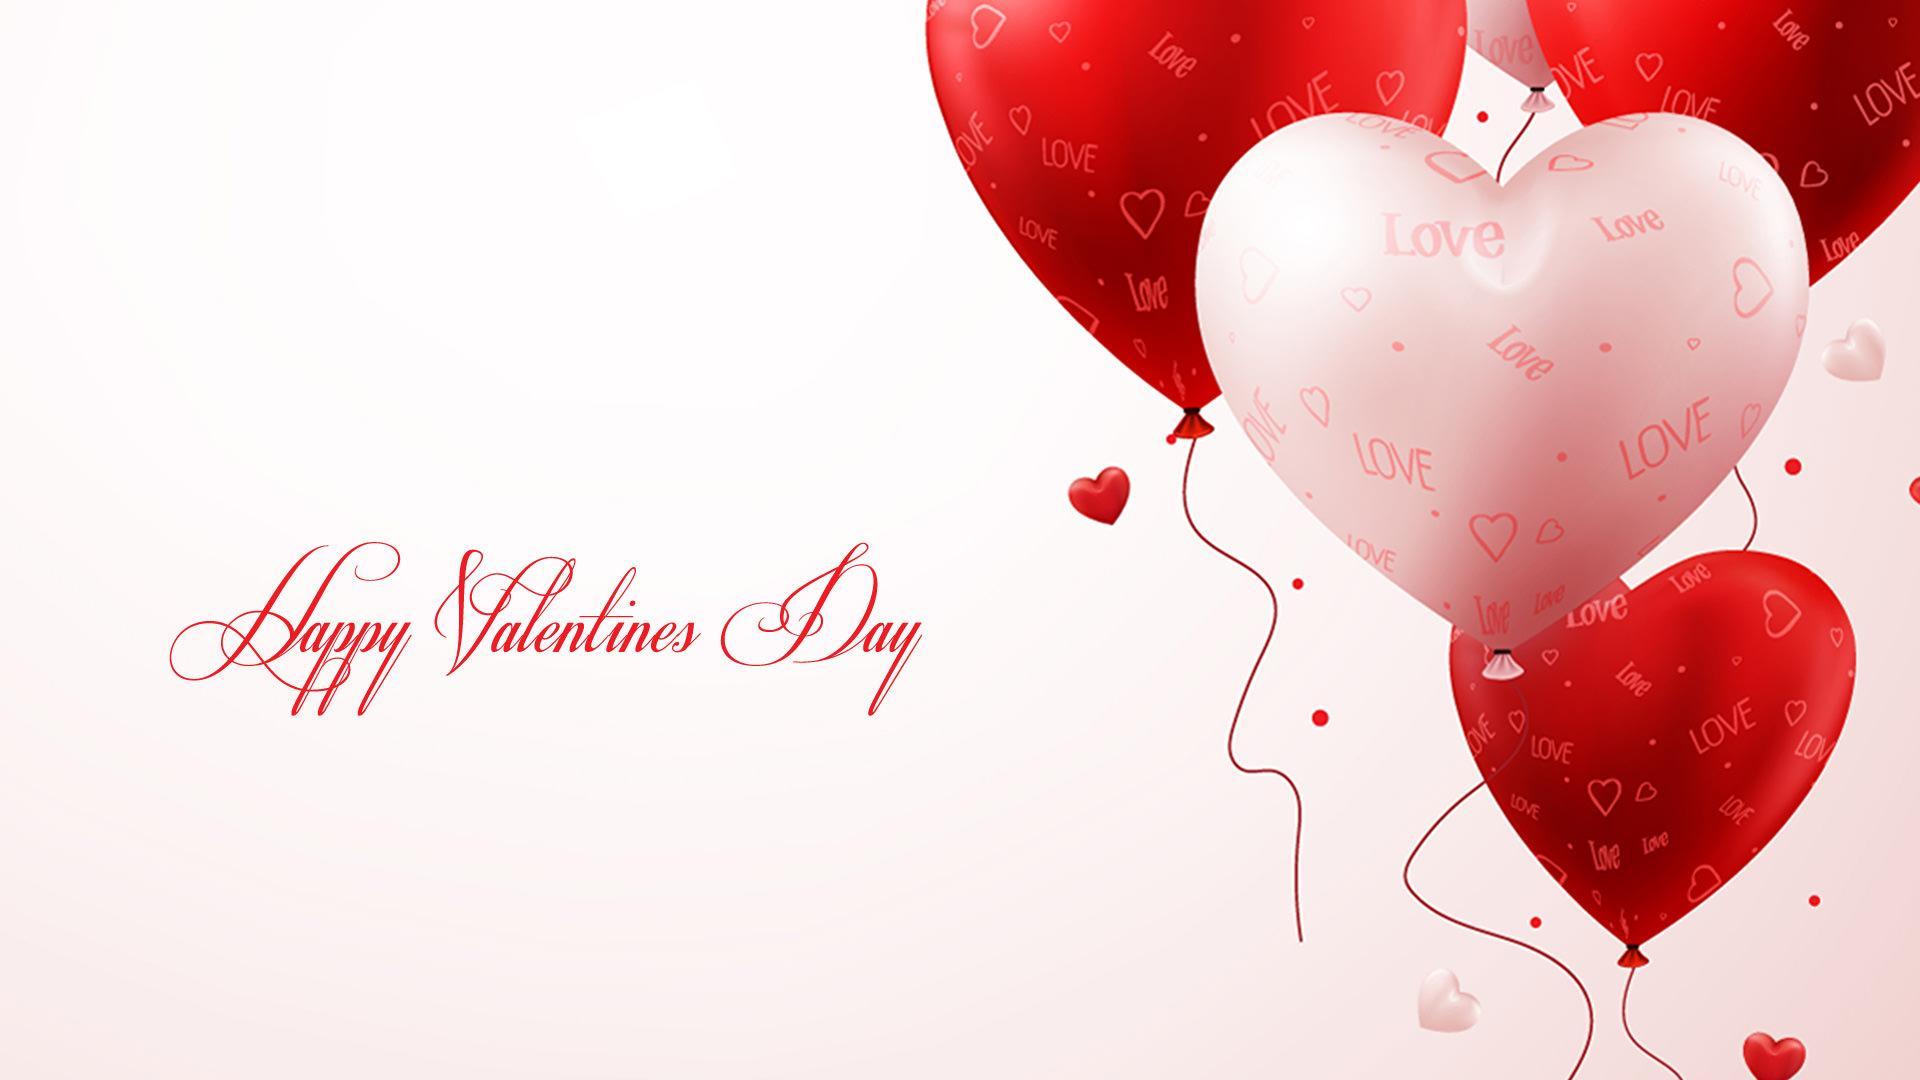 Valentine's Day Desktop 1920x1080 Wallpapers - Wallpaper Cave